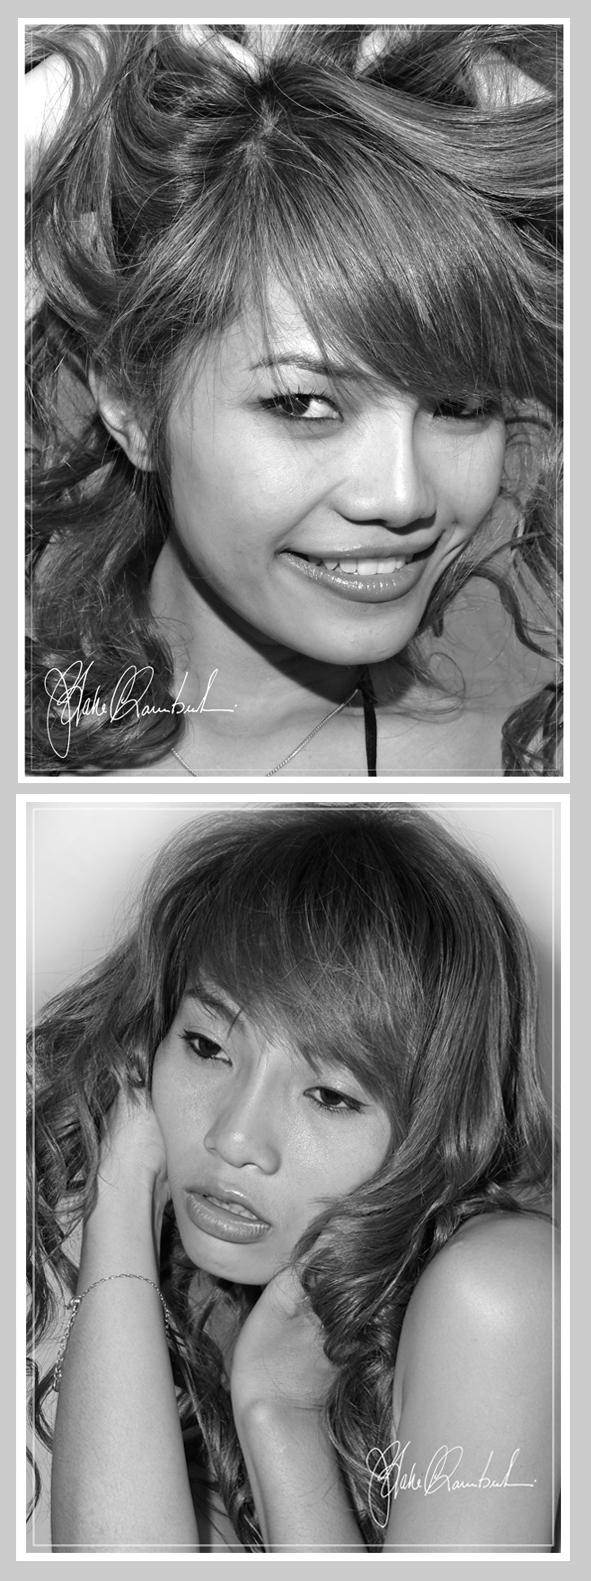 jay_blake - Mam & Ning 2009